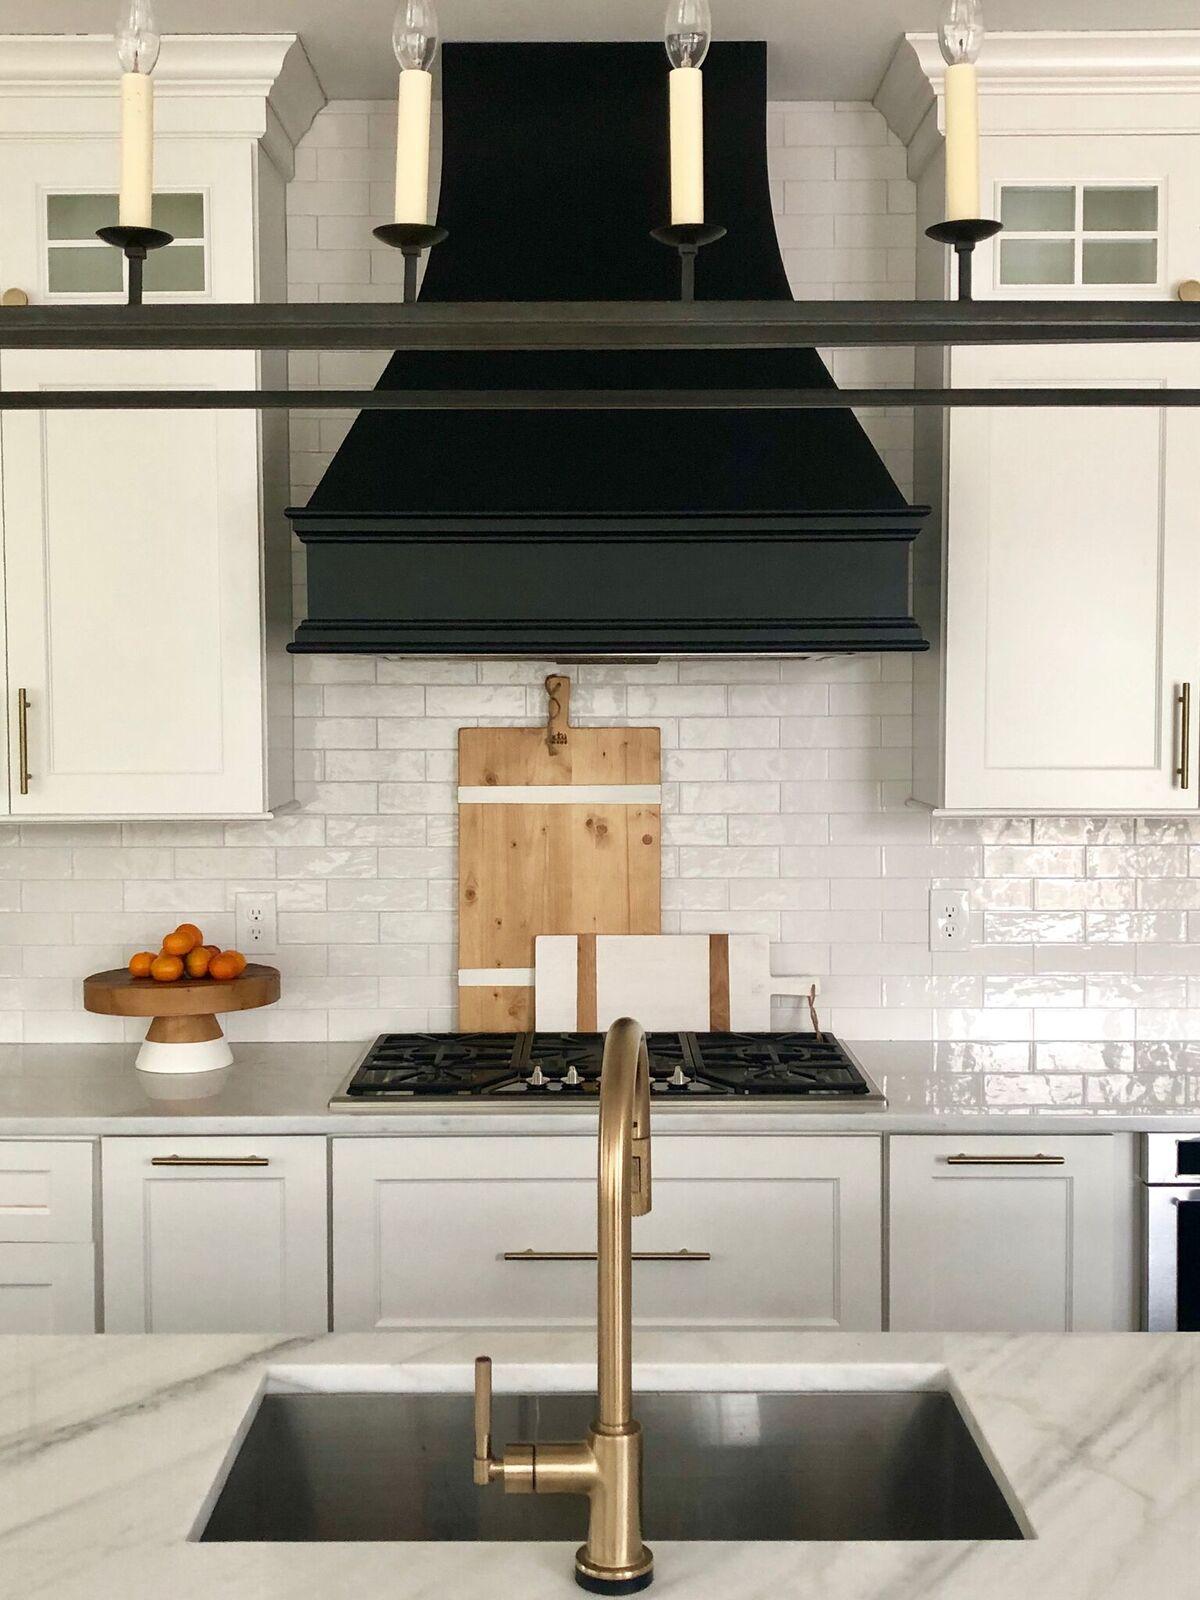 stephanie-kraus-designs-mainline-pa-kitchen-after-brass-faucet.jpg